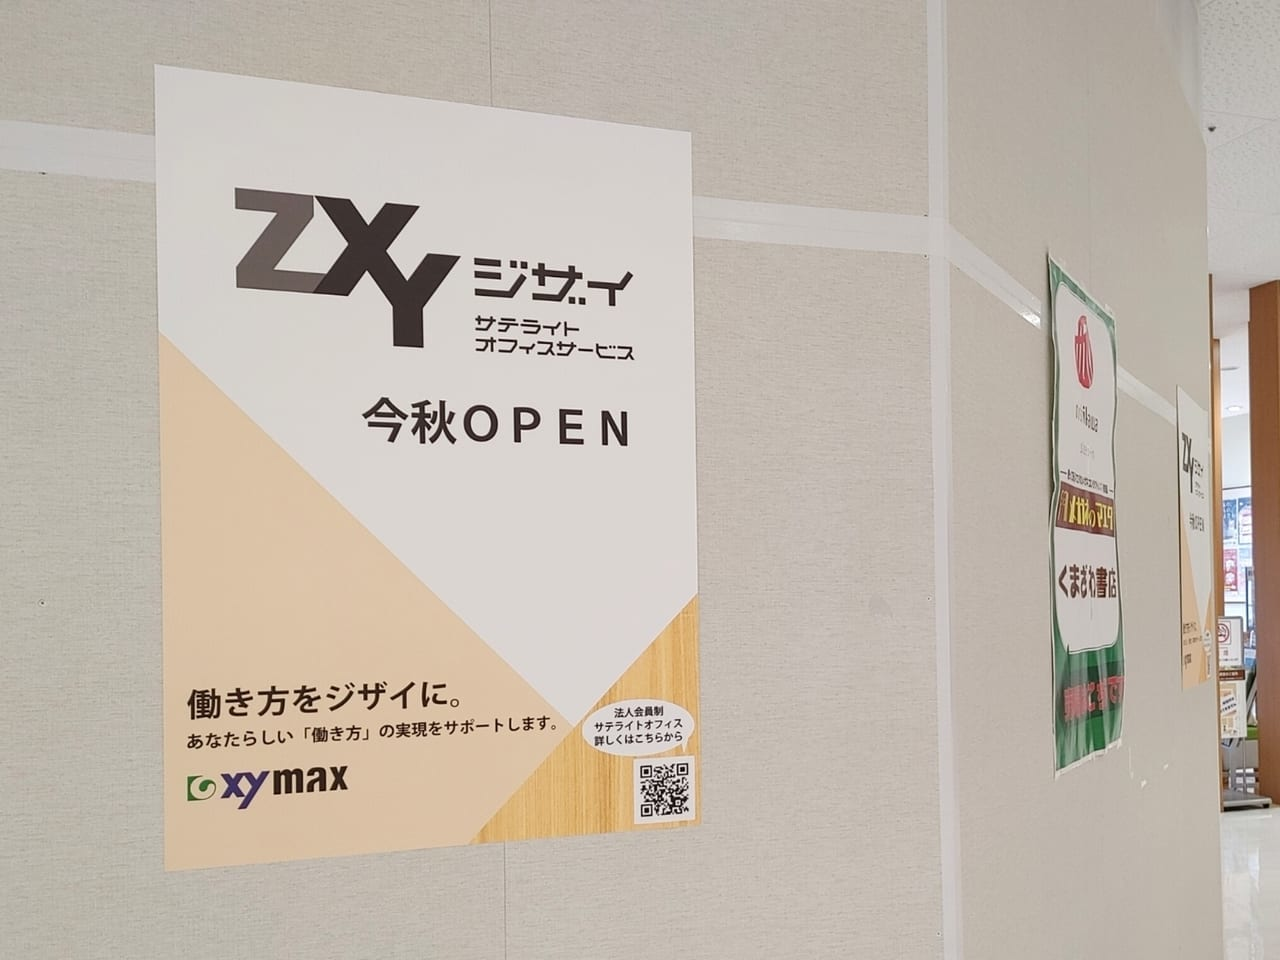 ZXY-POP